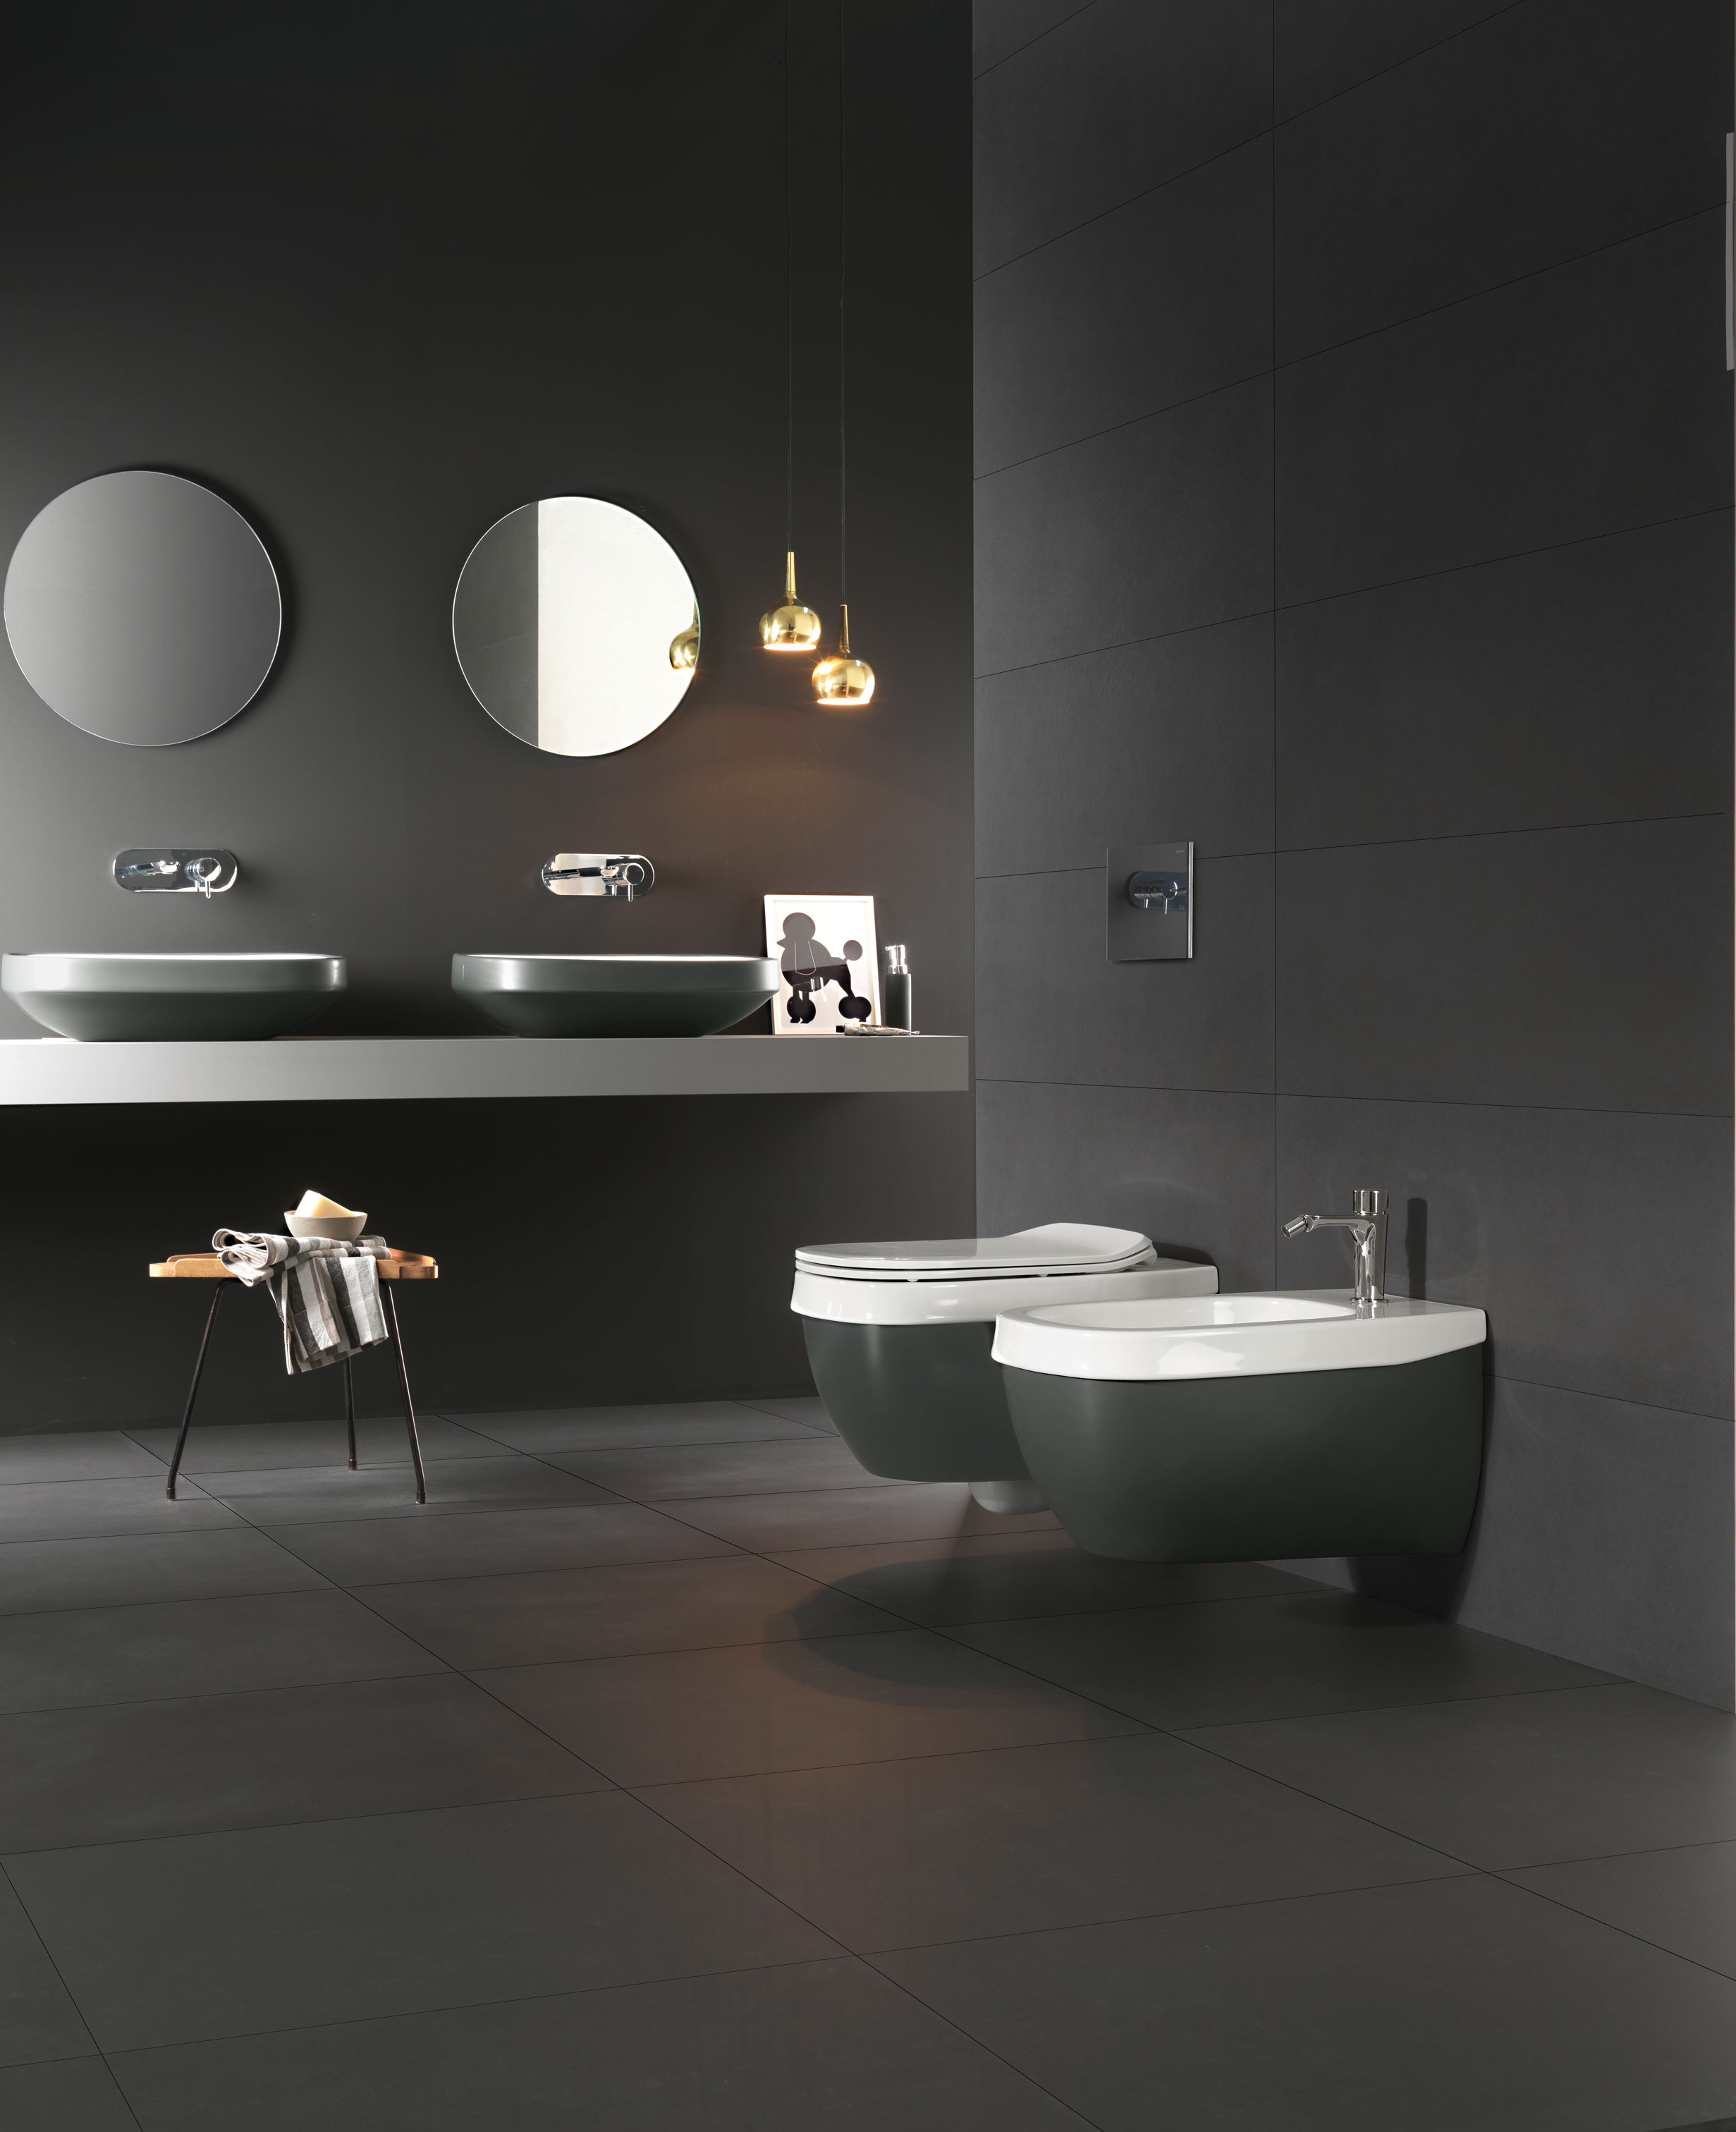 Michel César Hatria Abito black basins and wall-hung bidet and toilet.